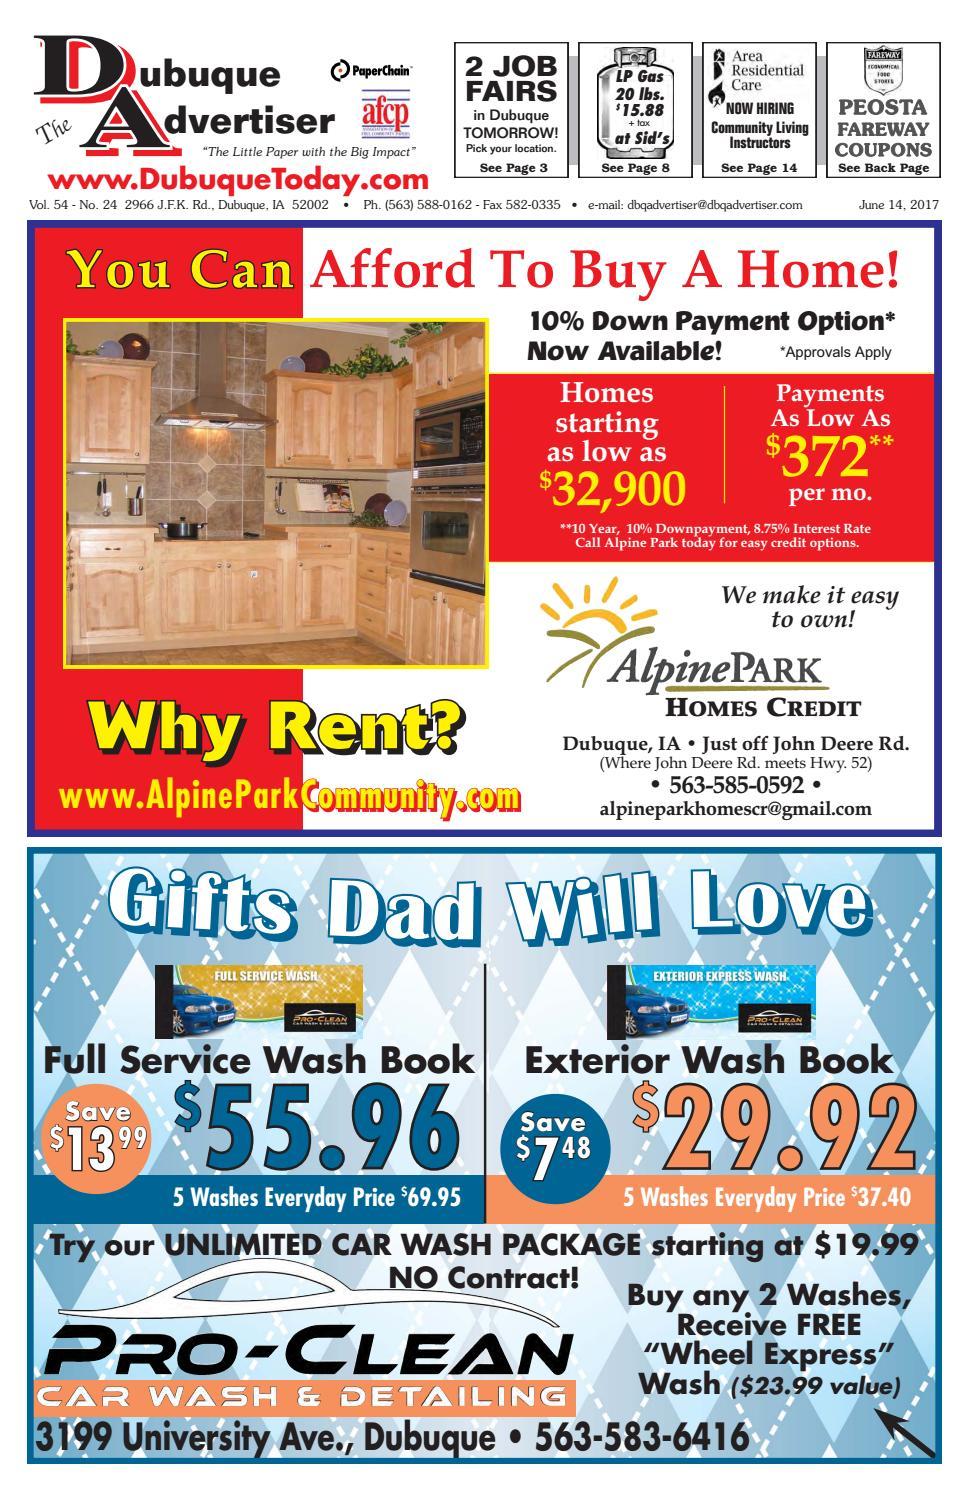 d6dff0827 The Dubuque Advertiser June 14